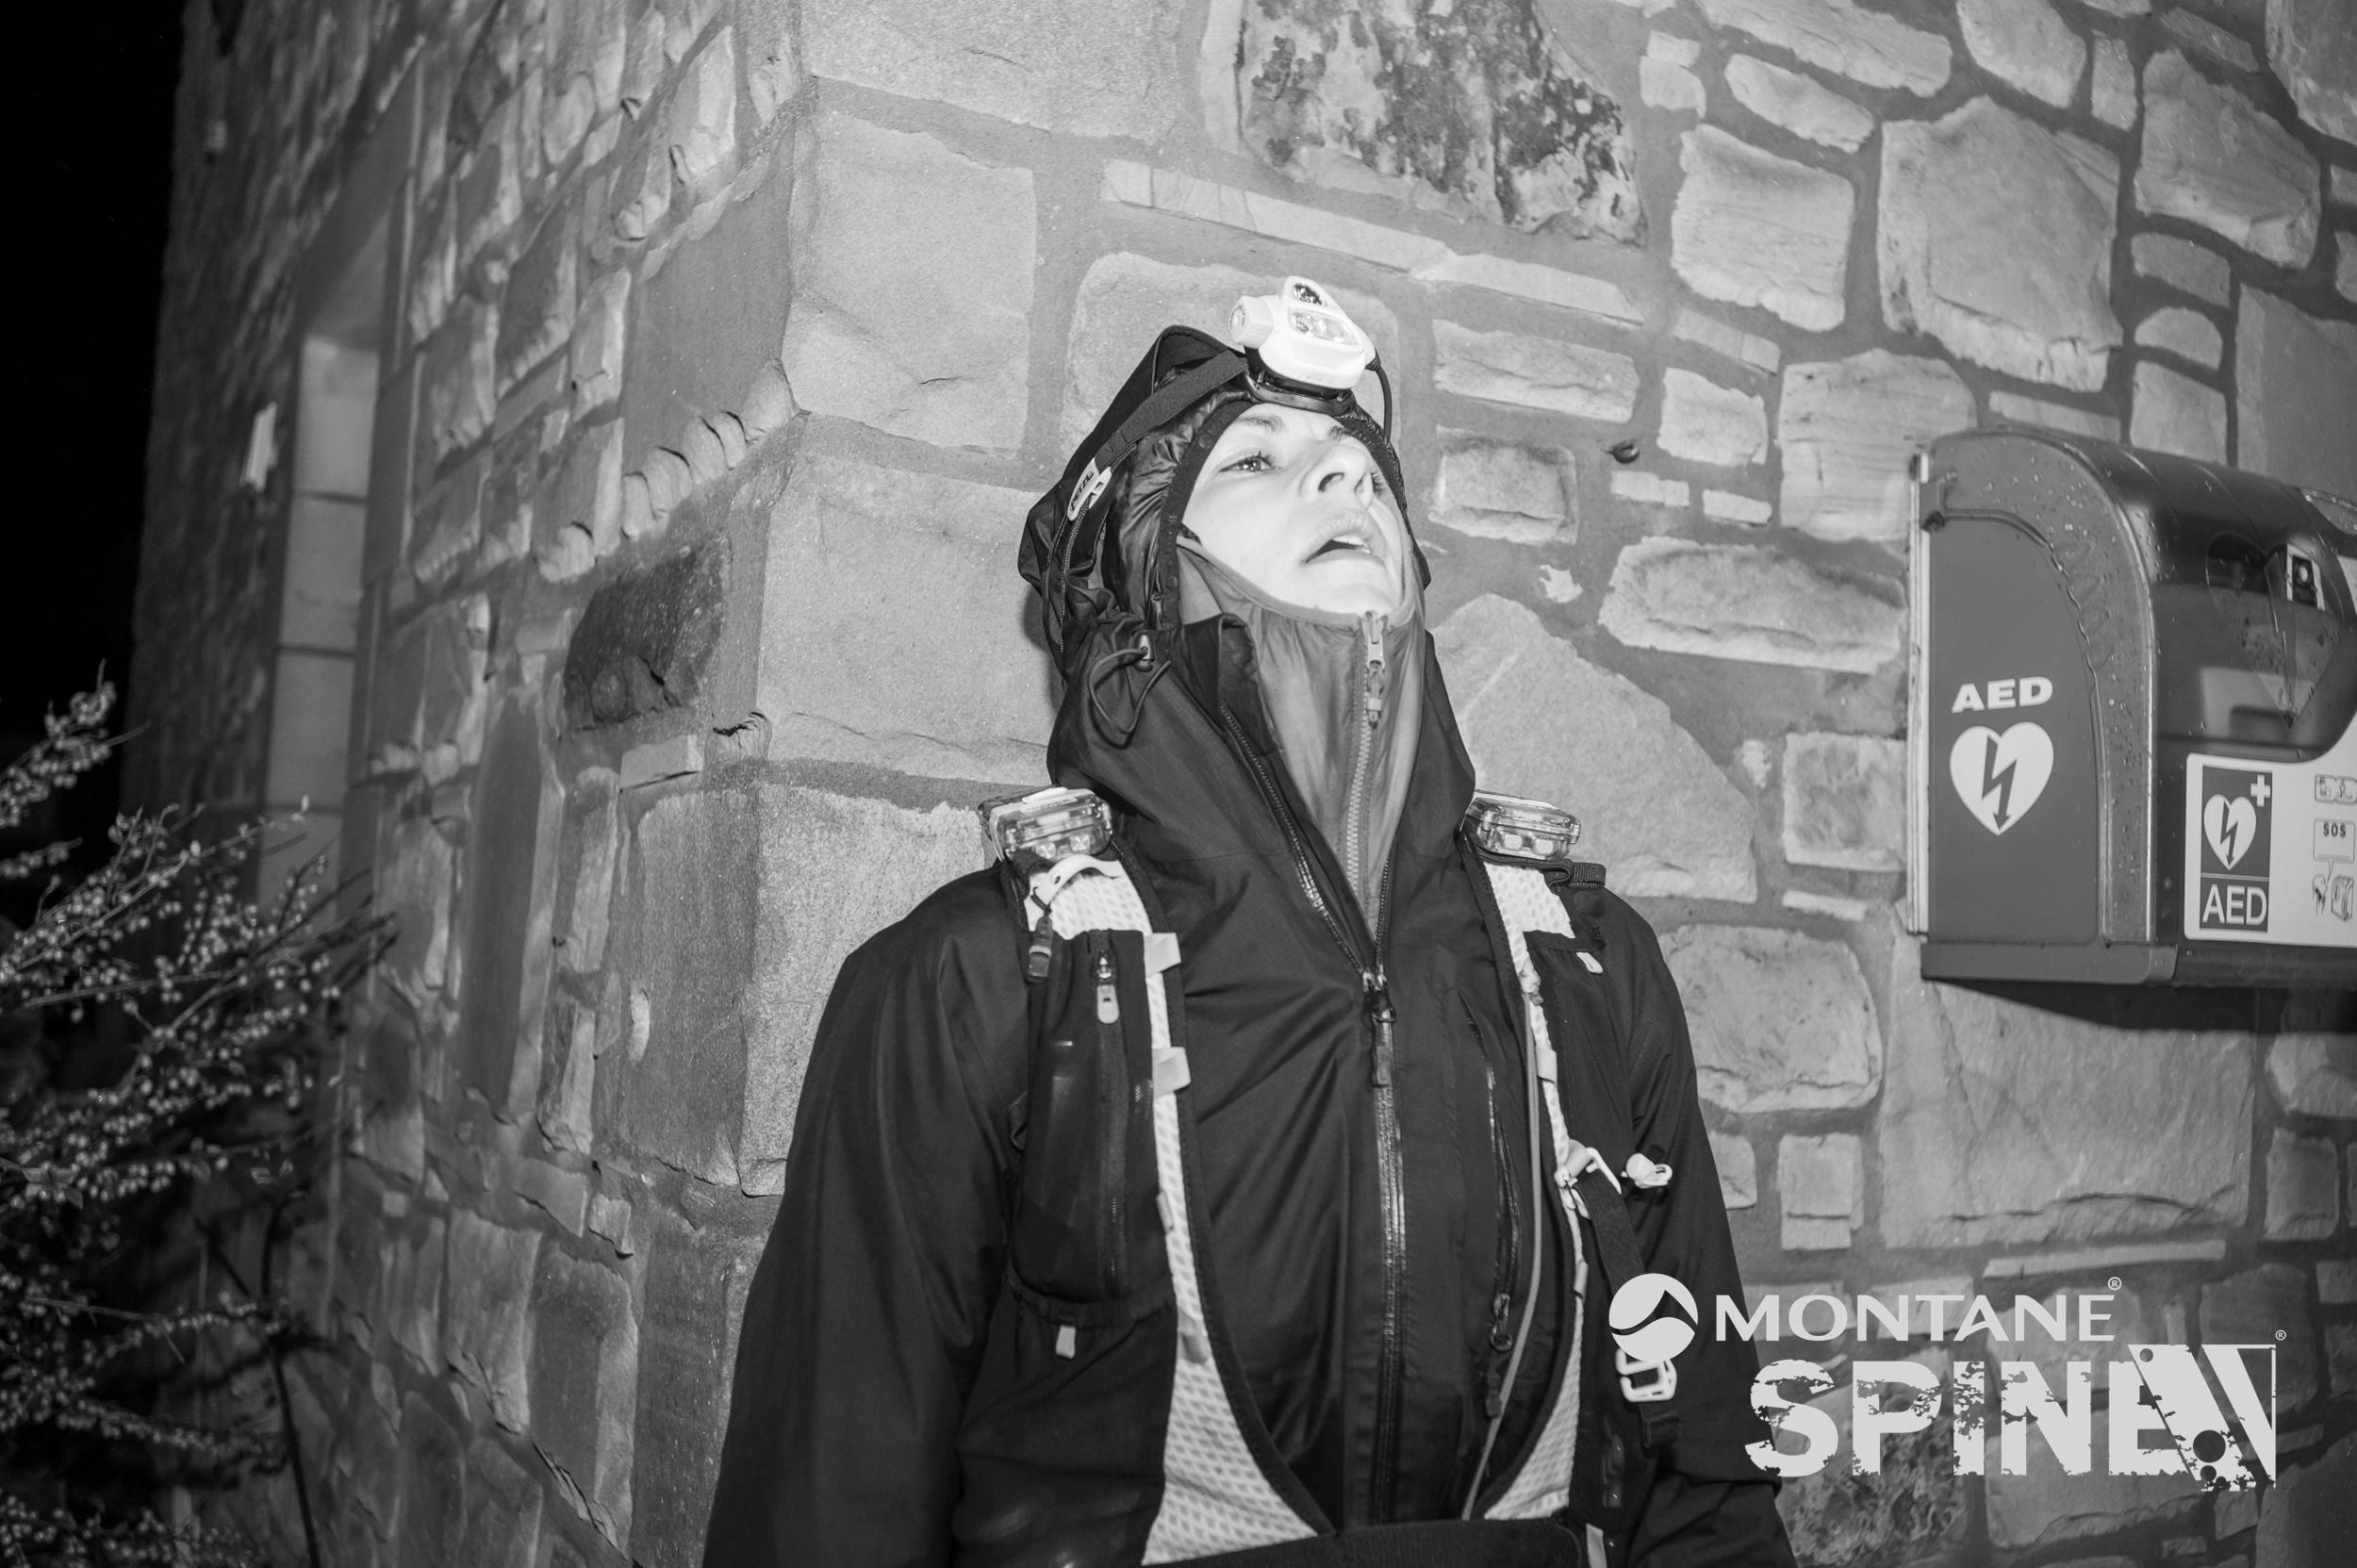 Image: Montane Spine Race